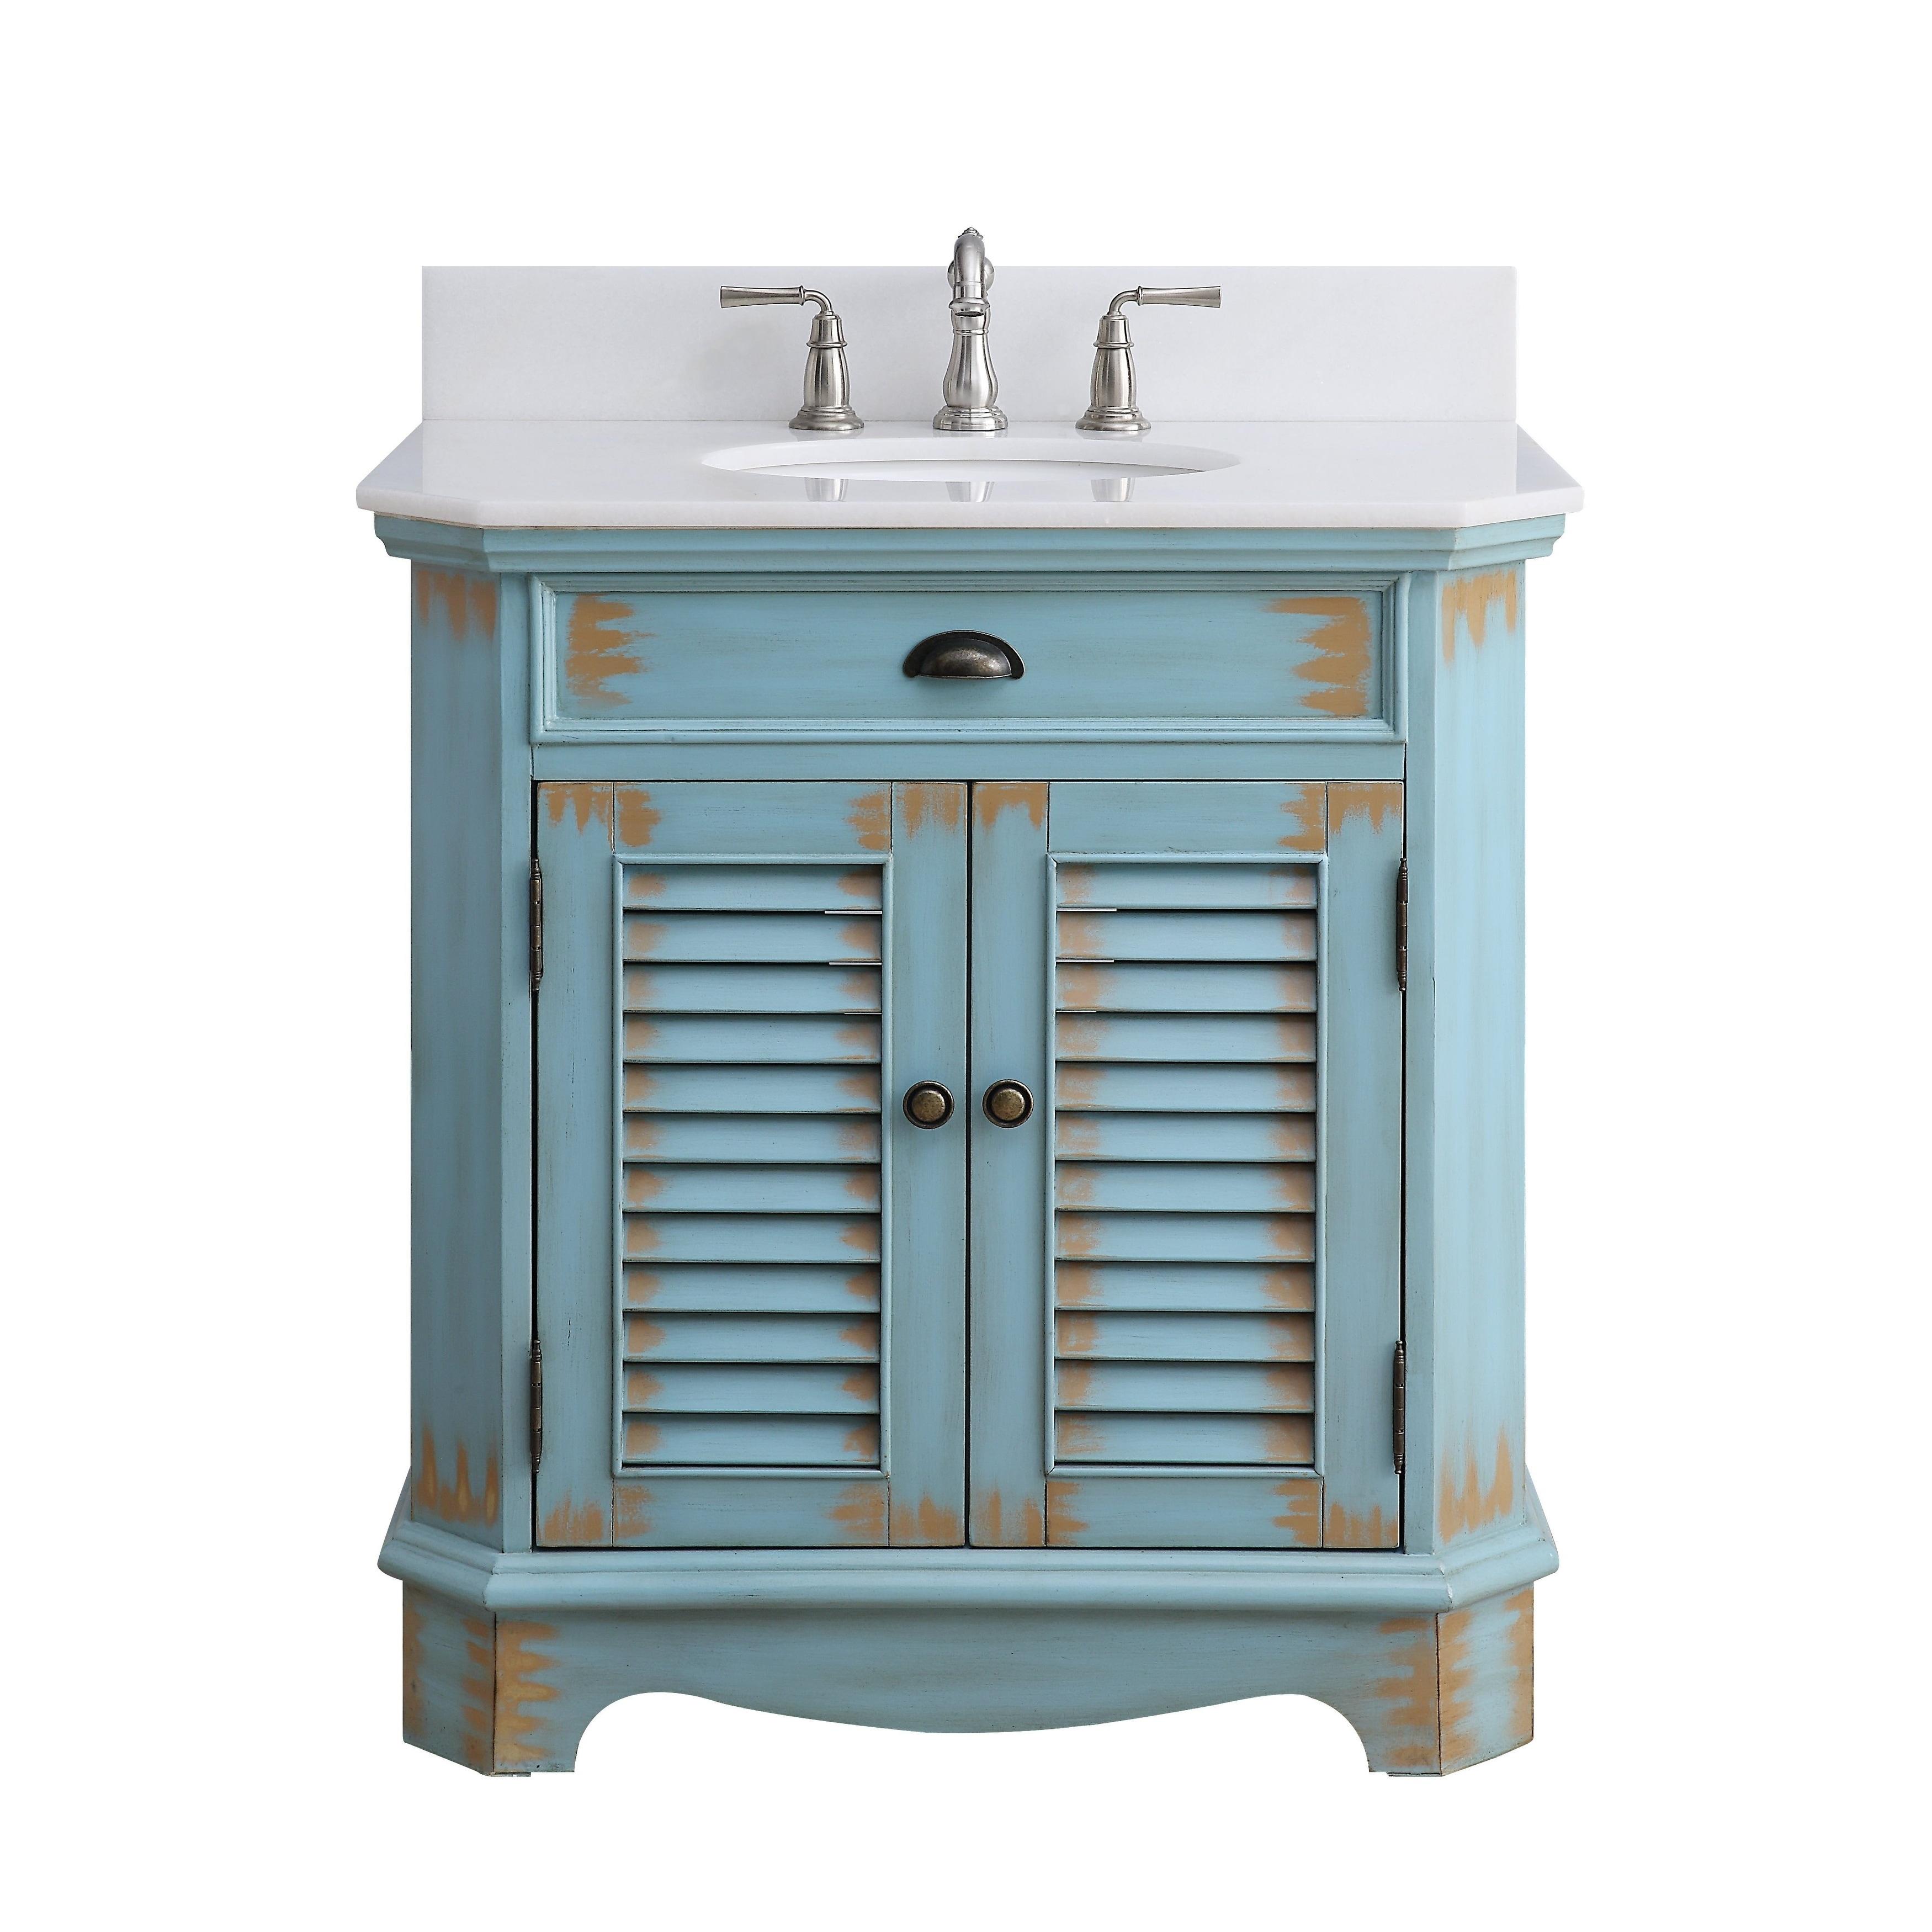 Buy Farmhouse Bathroom Vanities & Vanity Cabinets Online at ...